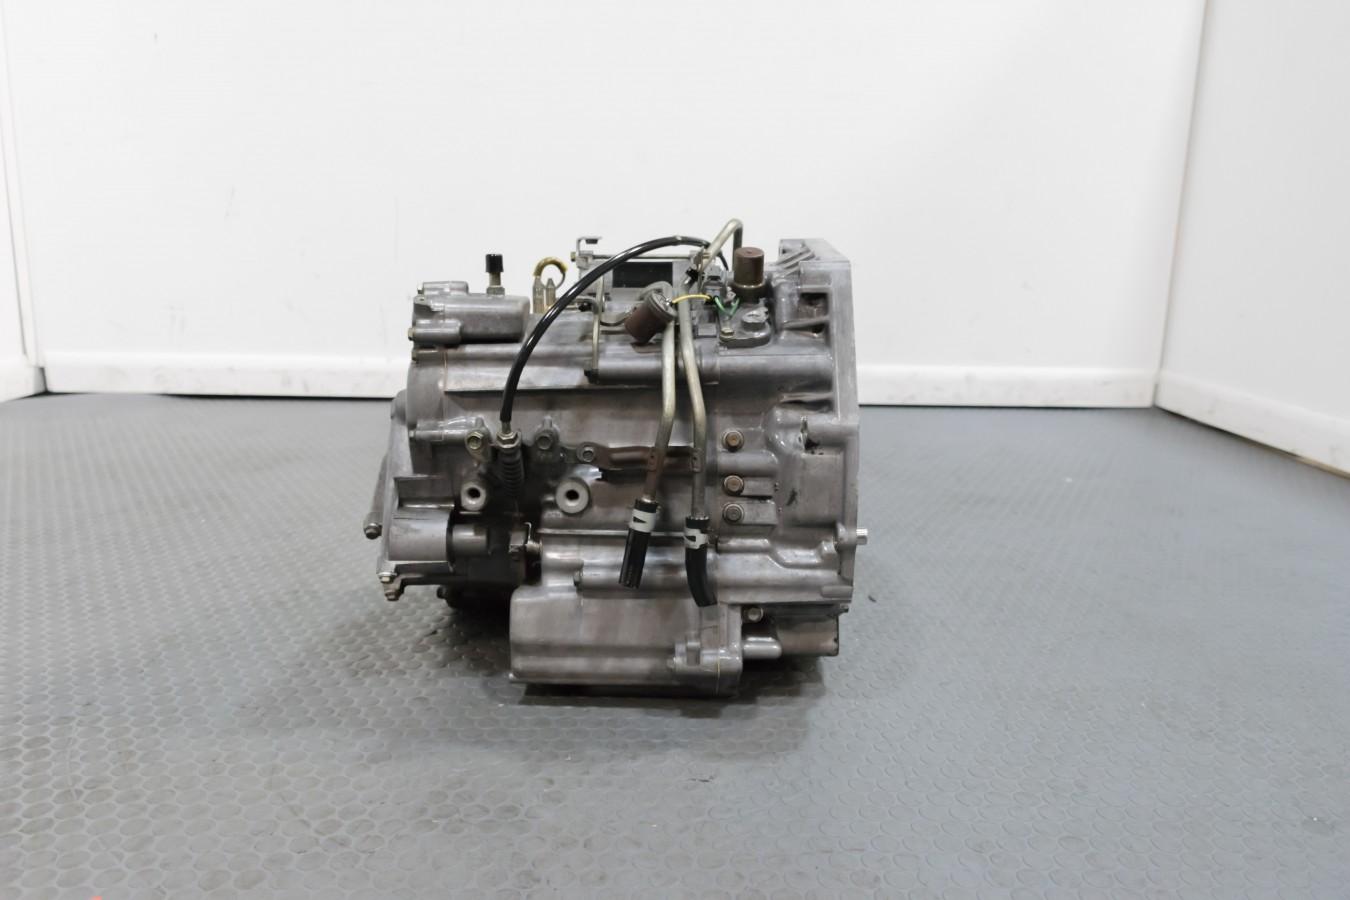 Honda del sol manual transmission